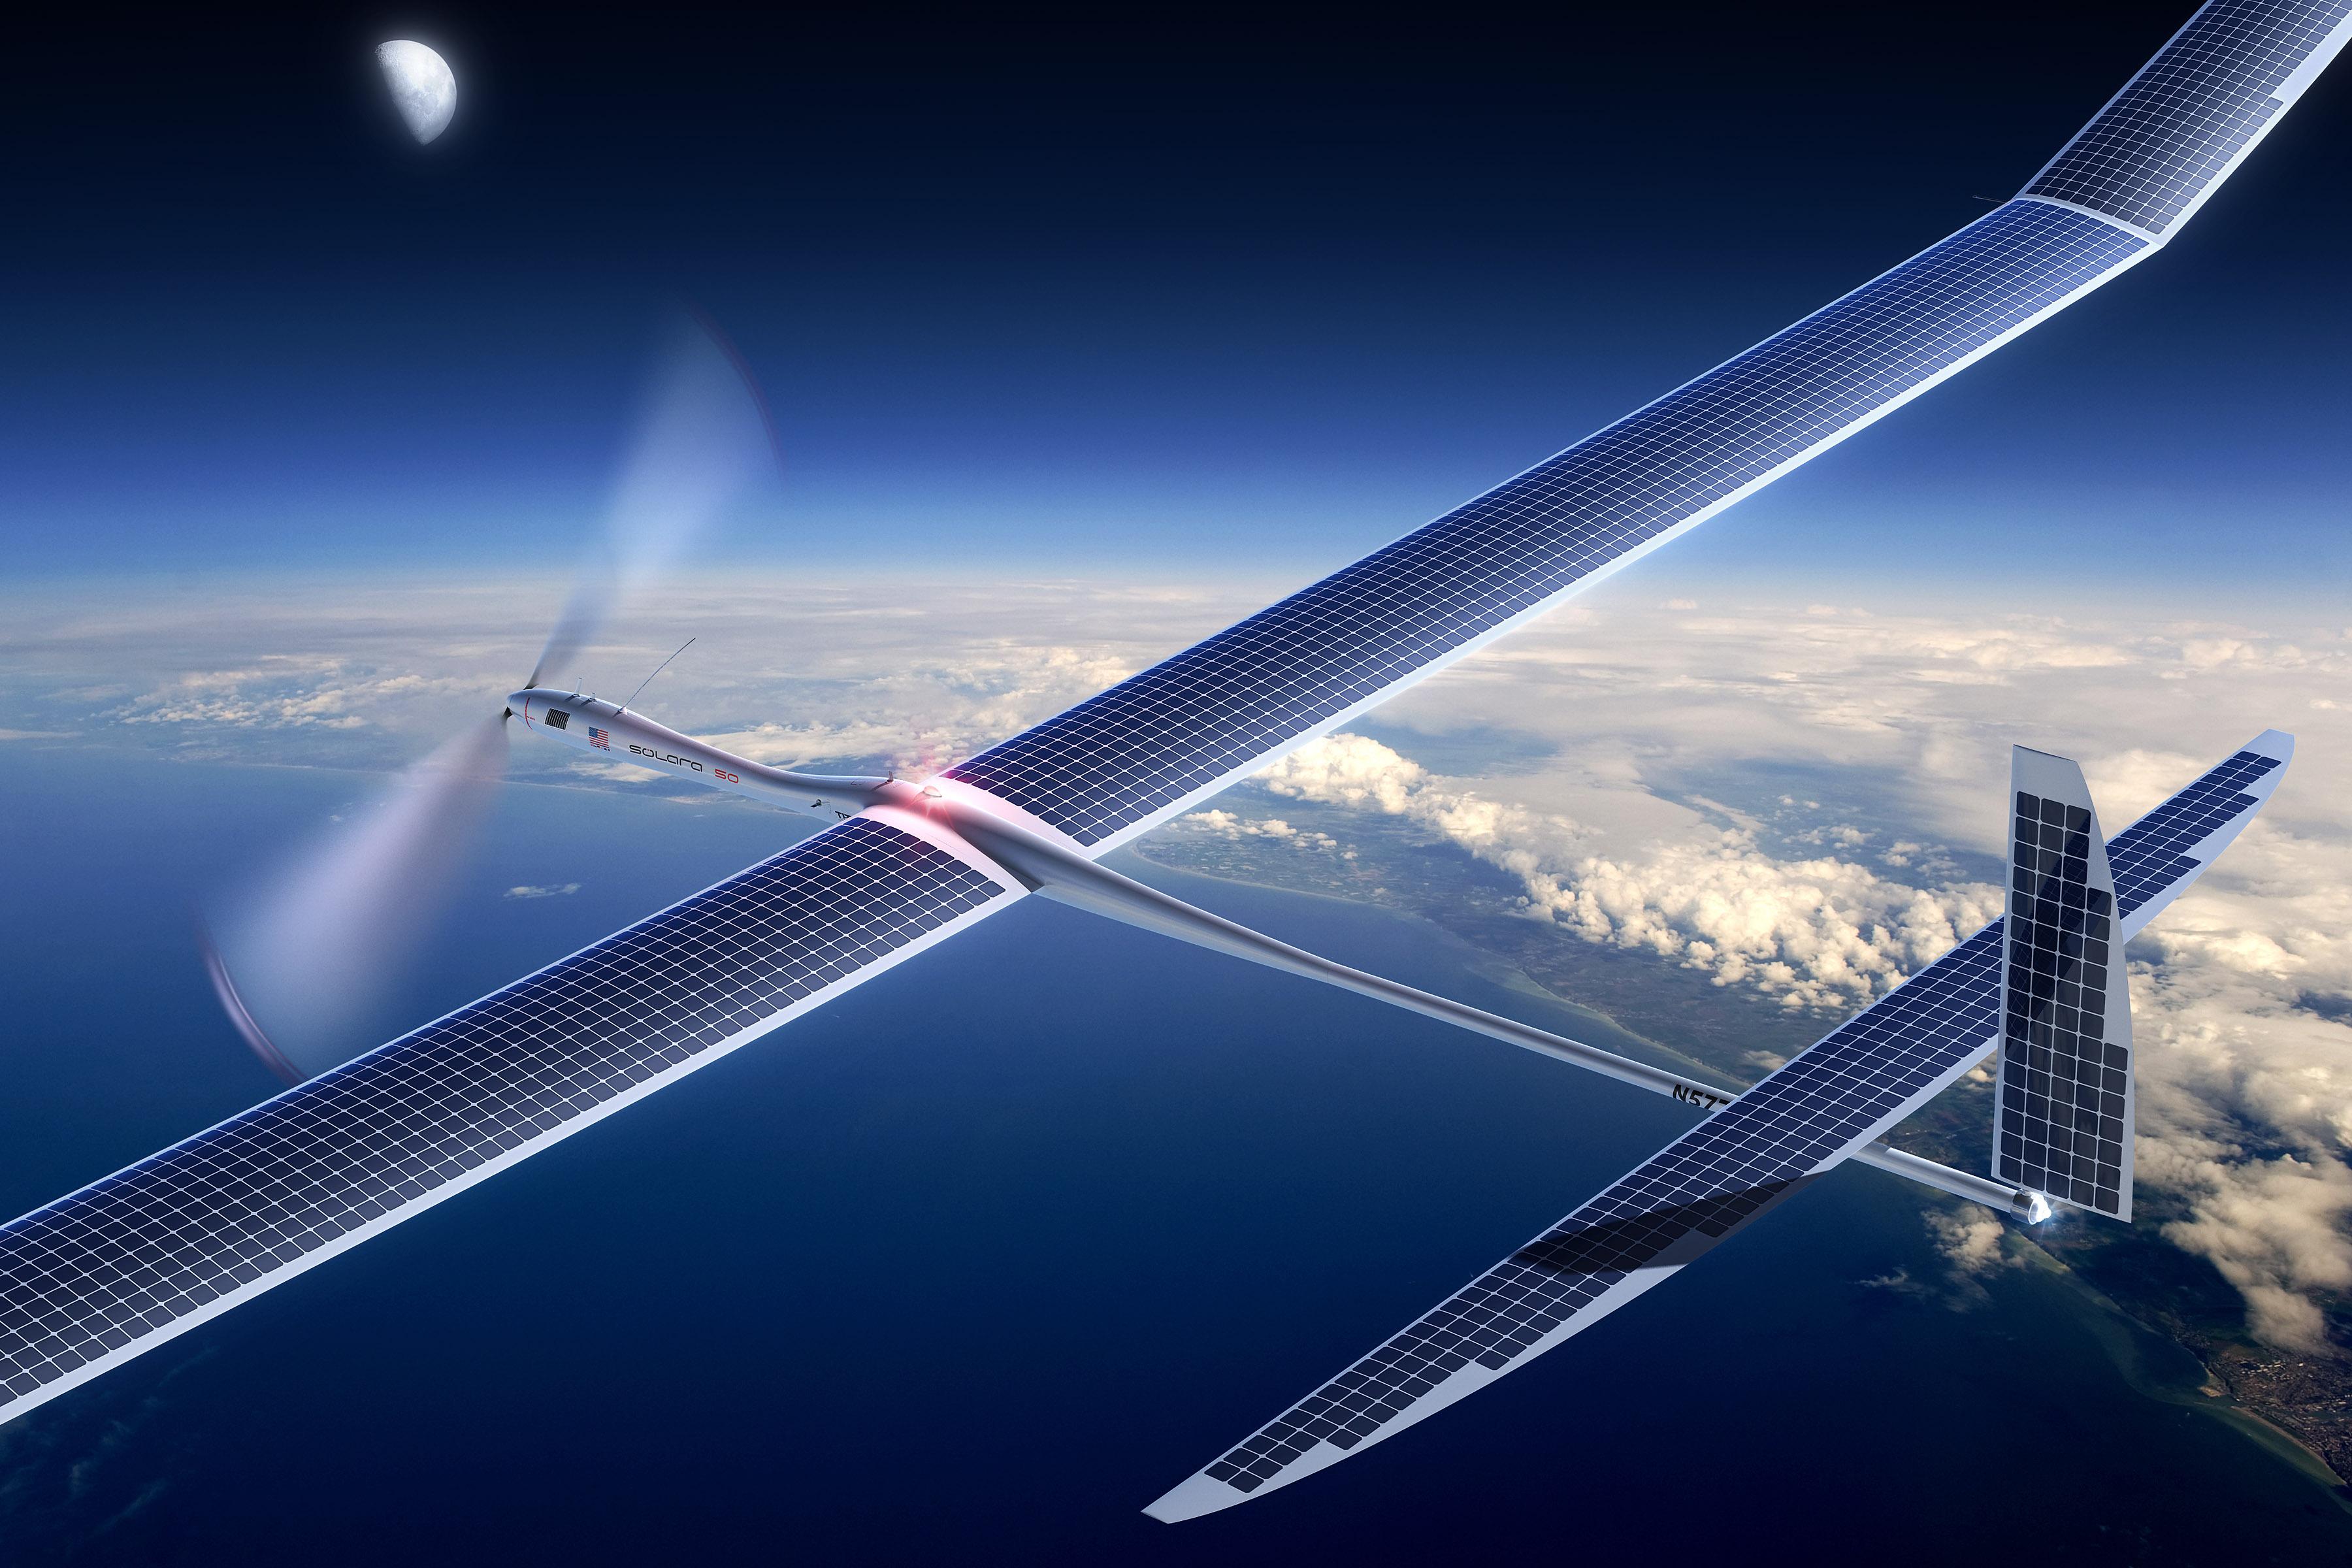 Titan Aerospace's Solara 50 drone